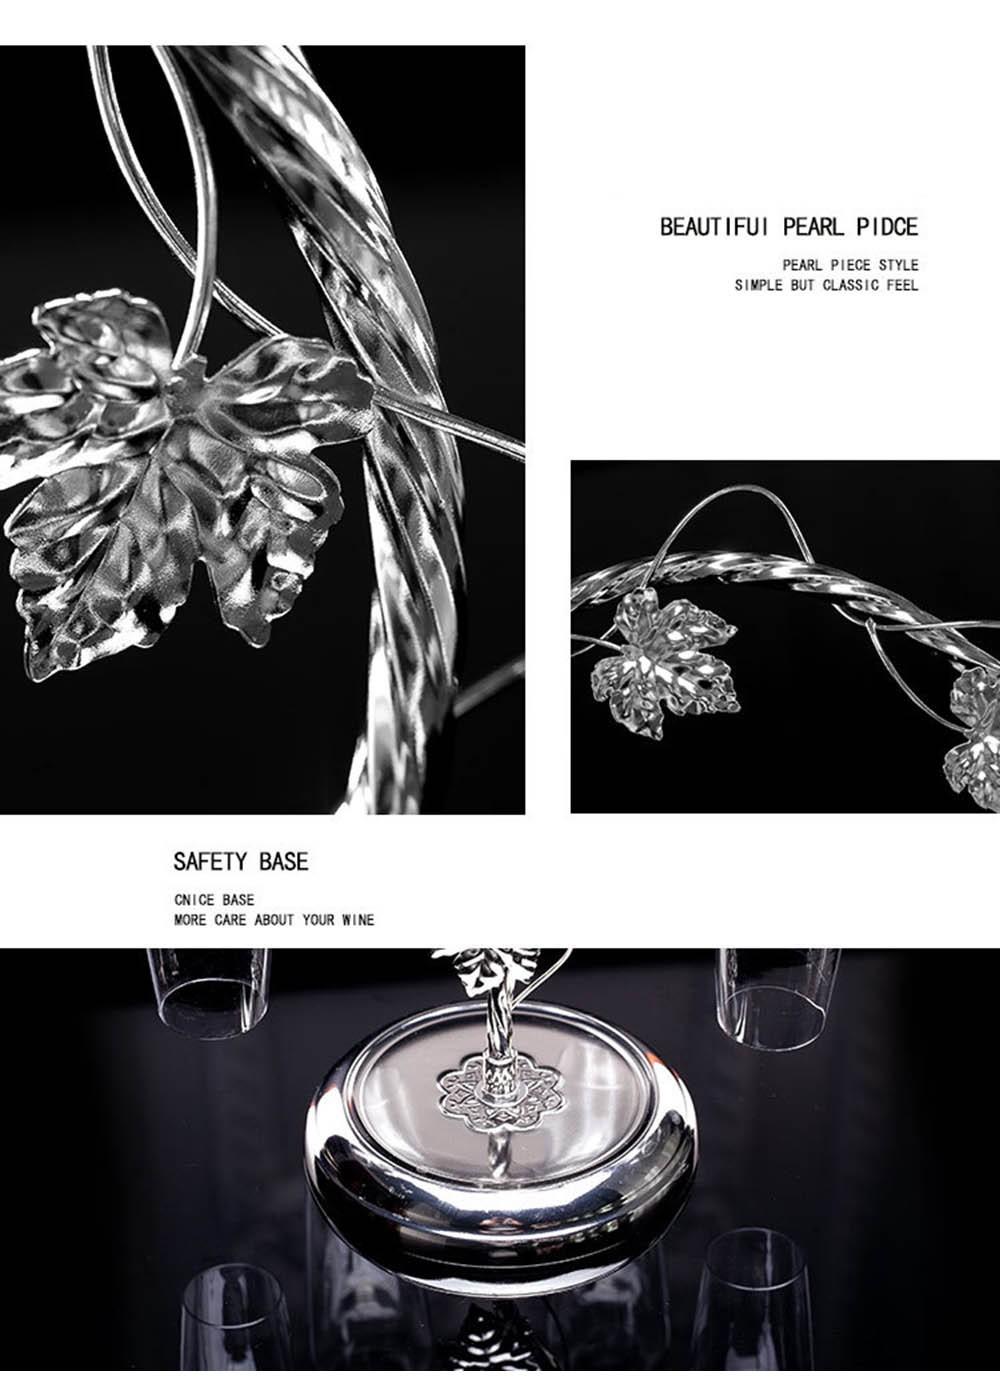 Fashion Decorative Metal Modern Hanging Wine Glass Racks Wine Cabinet Wedding Decor Gift Wine Glass Holder Wine Accessories KC1284 (8)